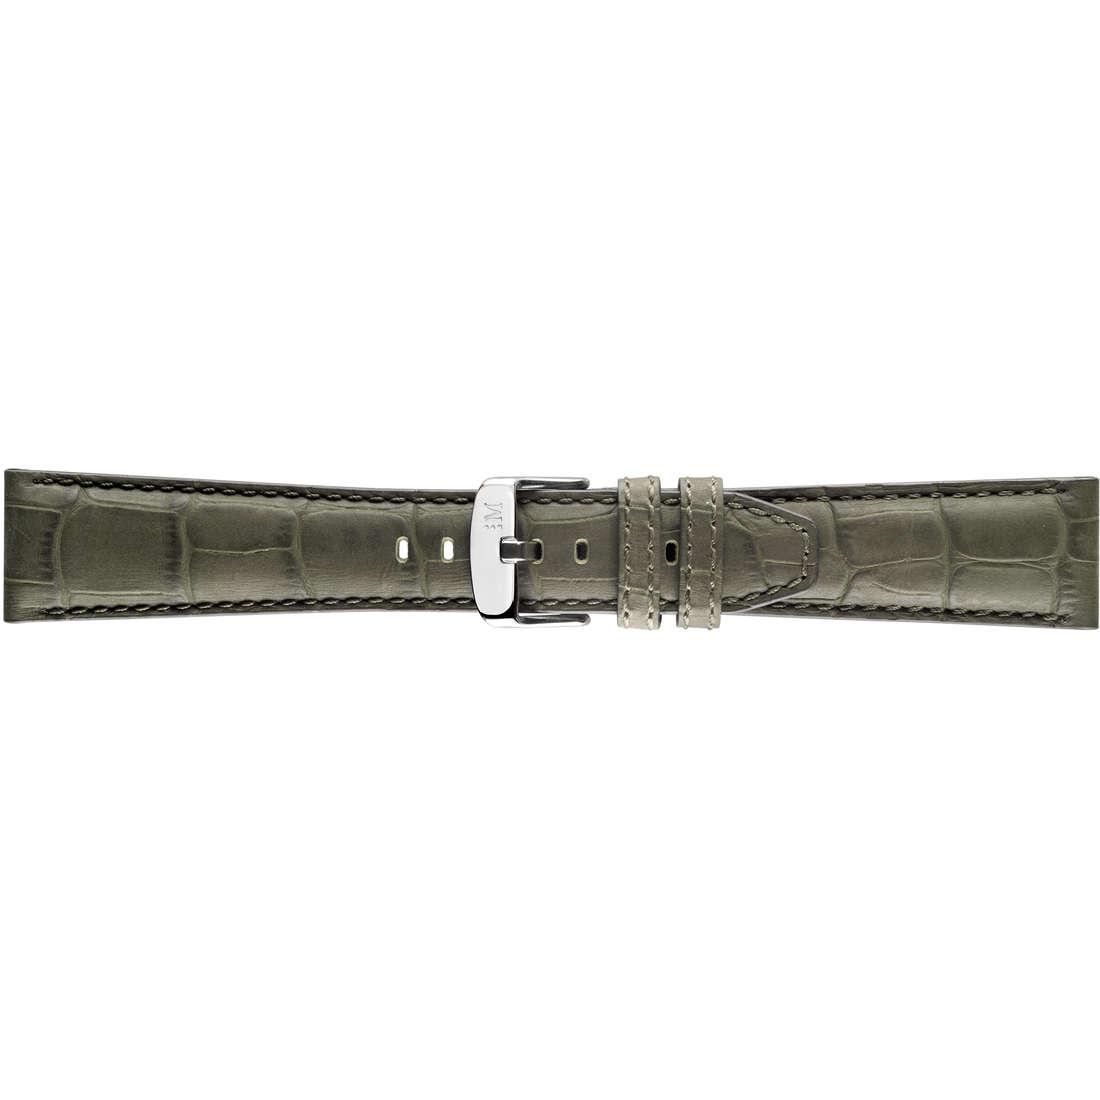 montre bande de montres homme Morellato Linea Sport A01X4497B44073CR20